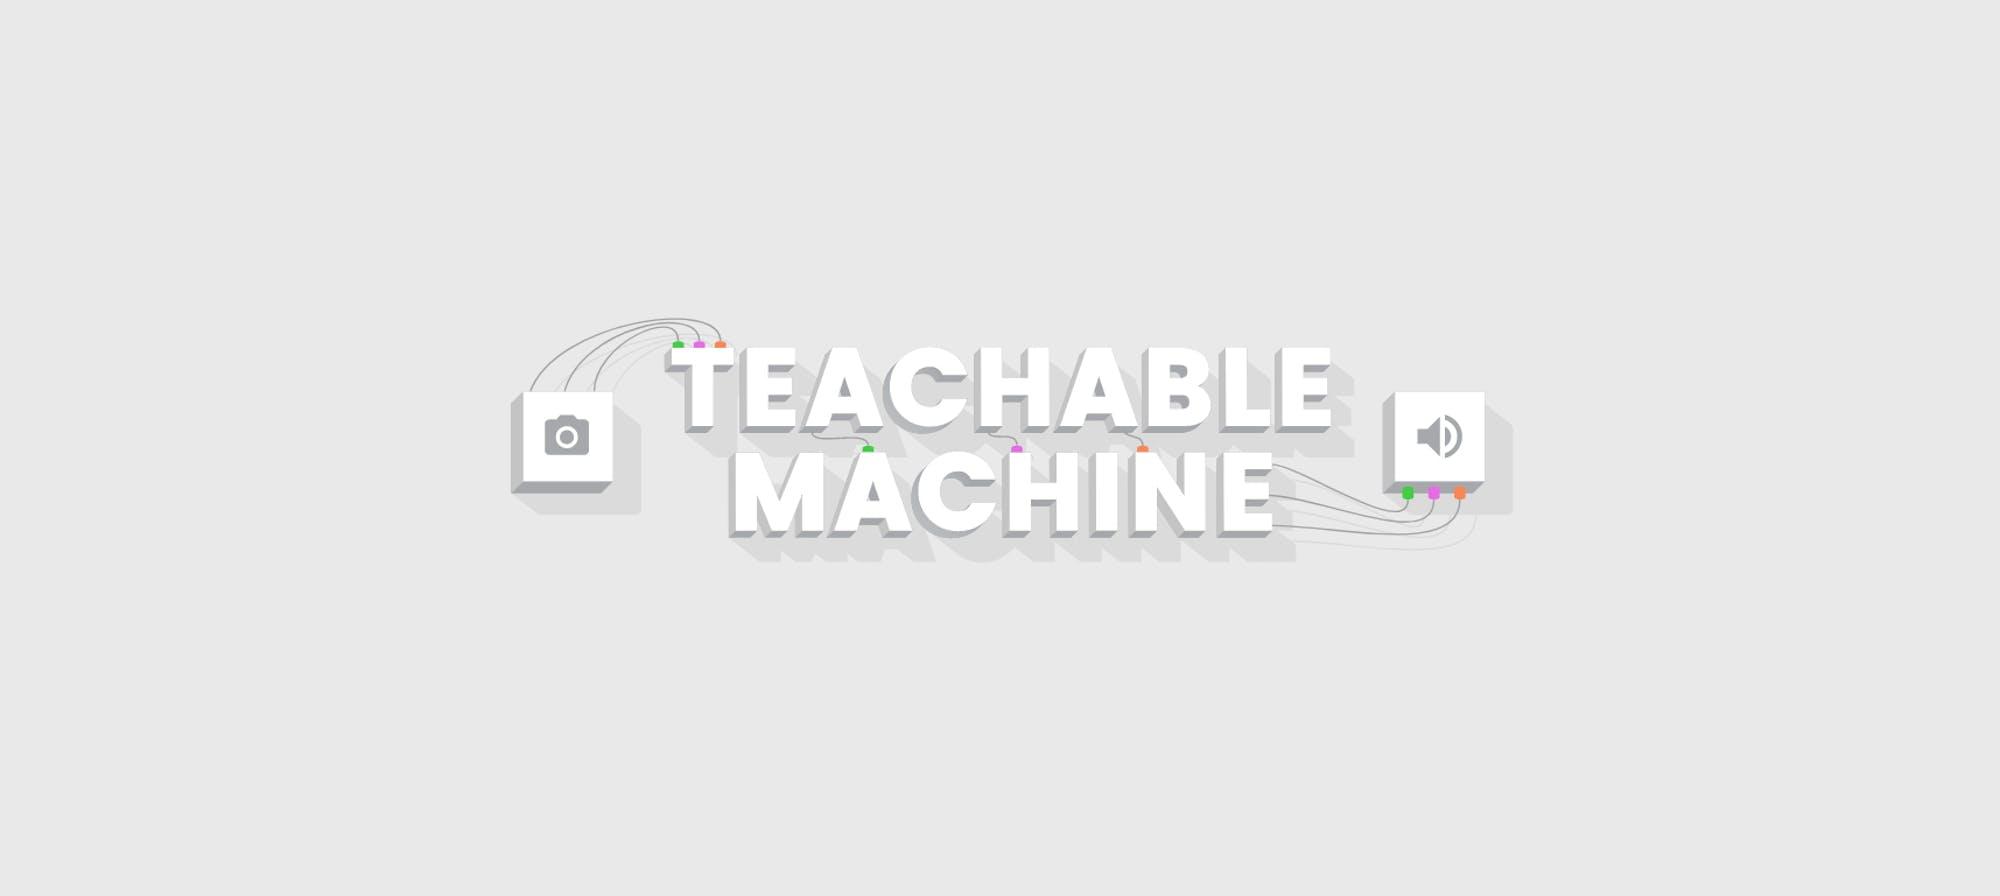 https://images.prismic.io/useallfive/NjEwMWMwNGMtNWZjNS00NjRiLThiY2YtMTM2OWMxM2E2MmI1_hero-image-teachable-machine.jpg?auto=compress,format&rect=0,0,1715,768&w=1715&h=768